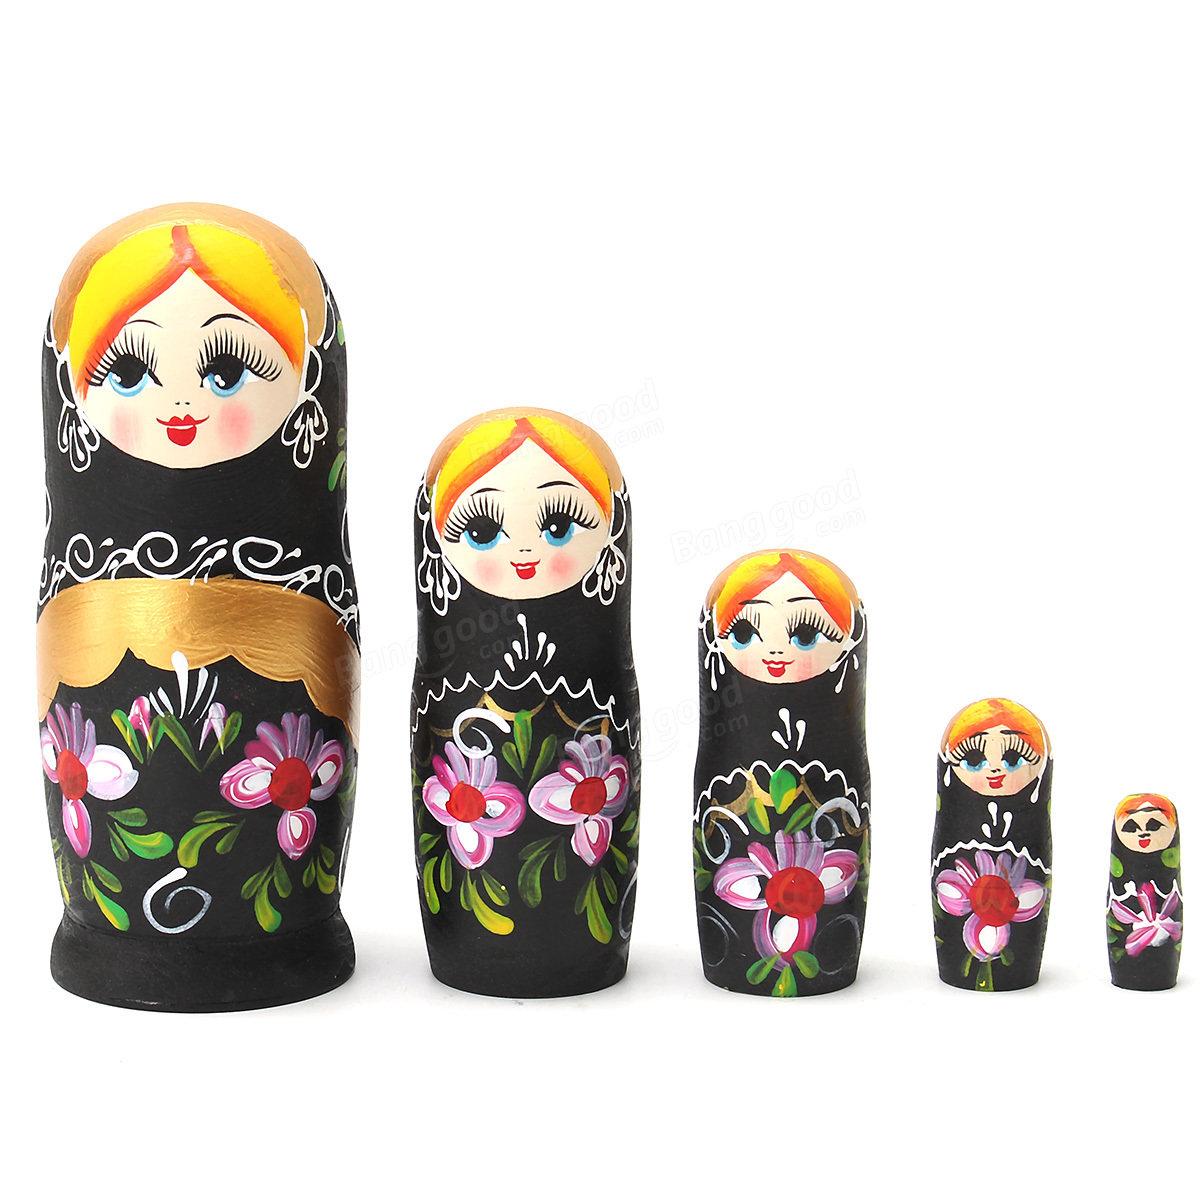 NEW 5pcs/set Matryoshka Russian Nesting Dolls Babushka Wooden BLACK Gift Flowers